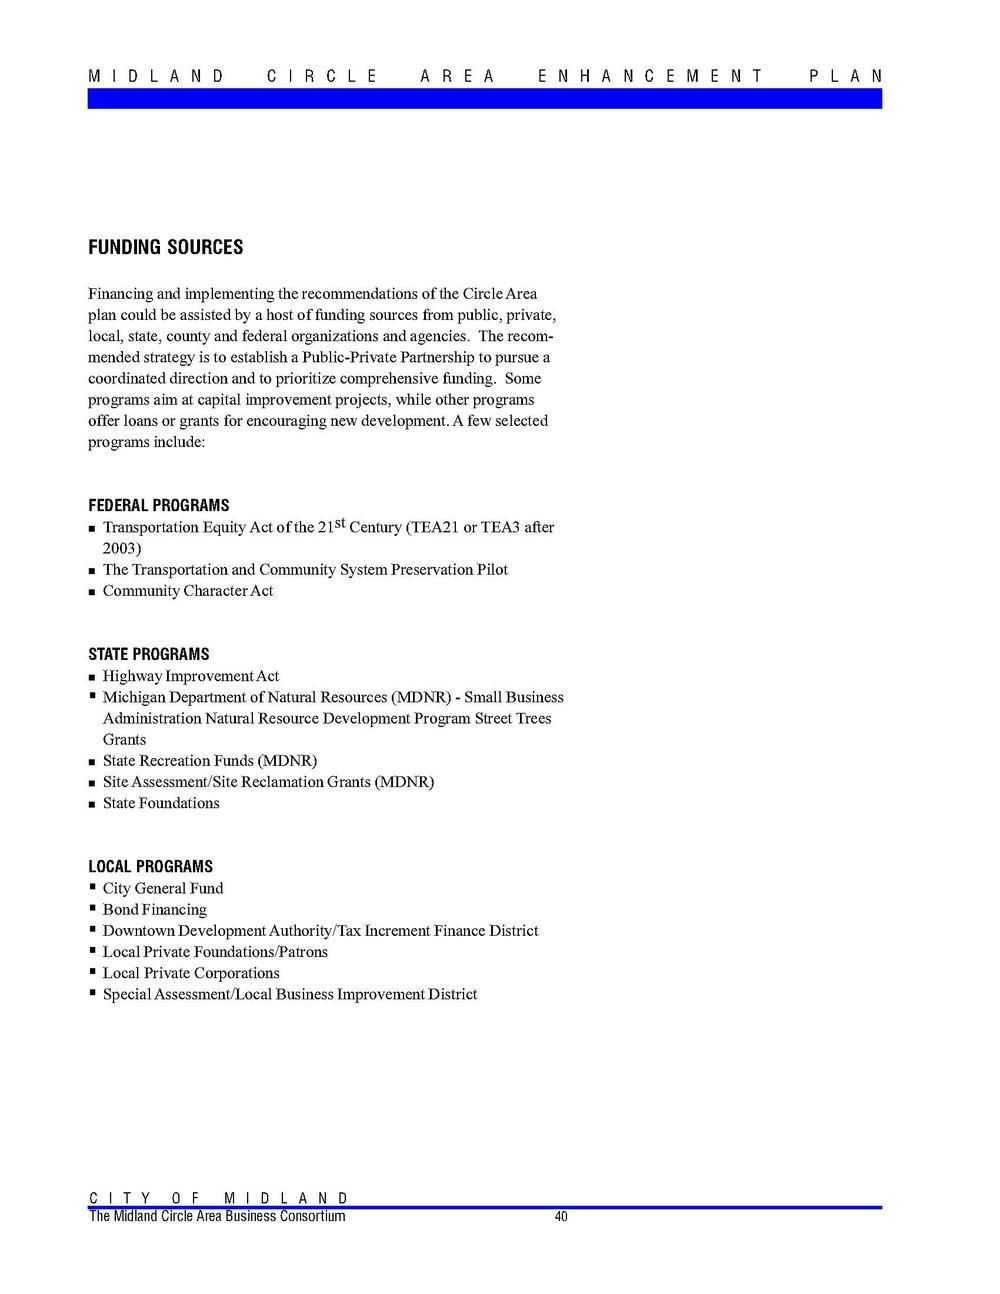 Ashman Circle Enhancement Plan_Page_42.jpg